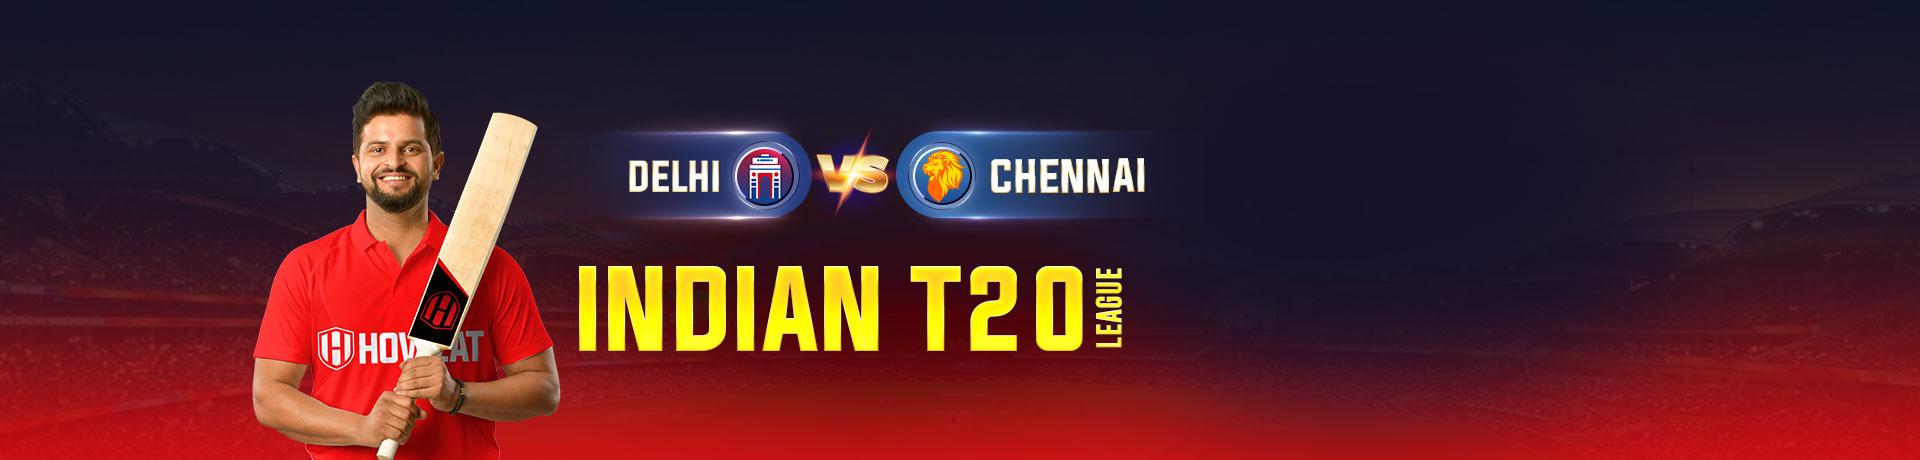 Delhi vs Chennai Indian T20 League